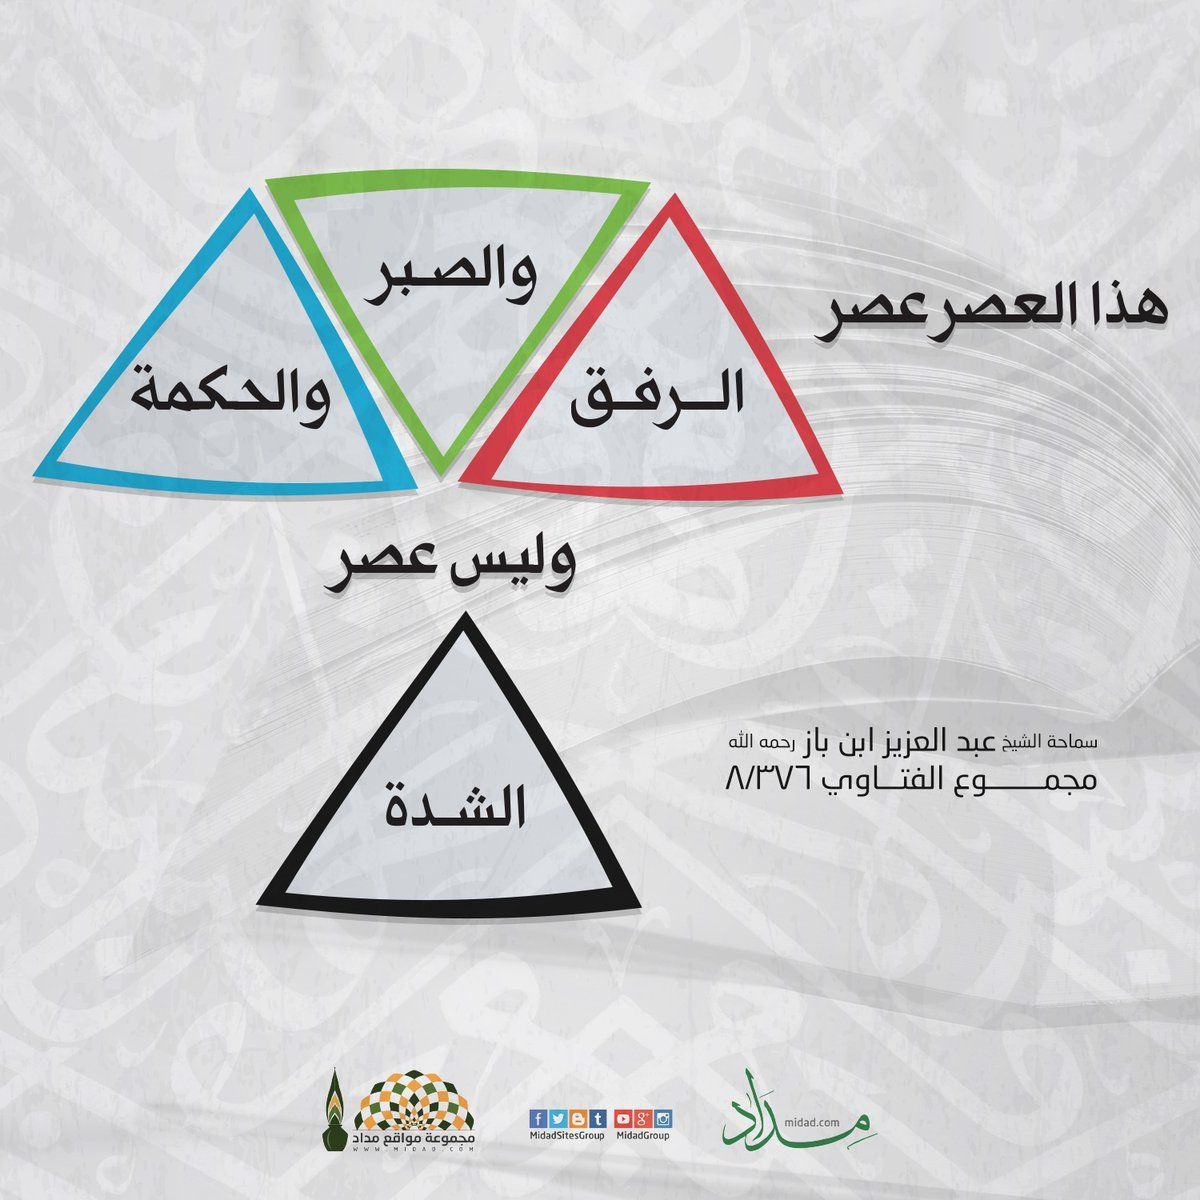 Image Result For الرفق وعدم ايذاء الاطفال Life Management Cards Life